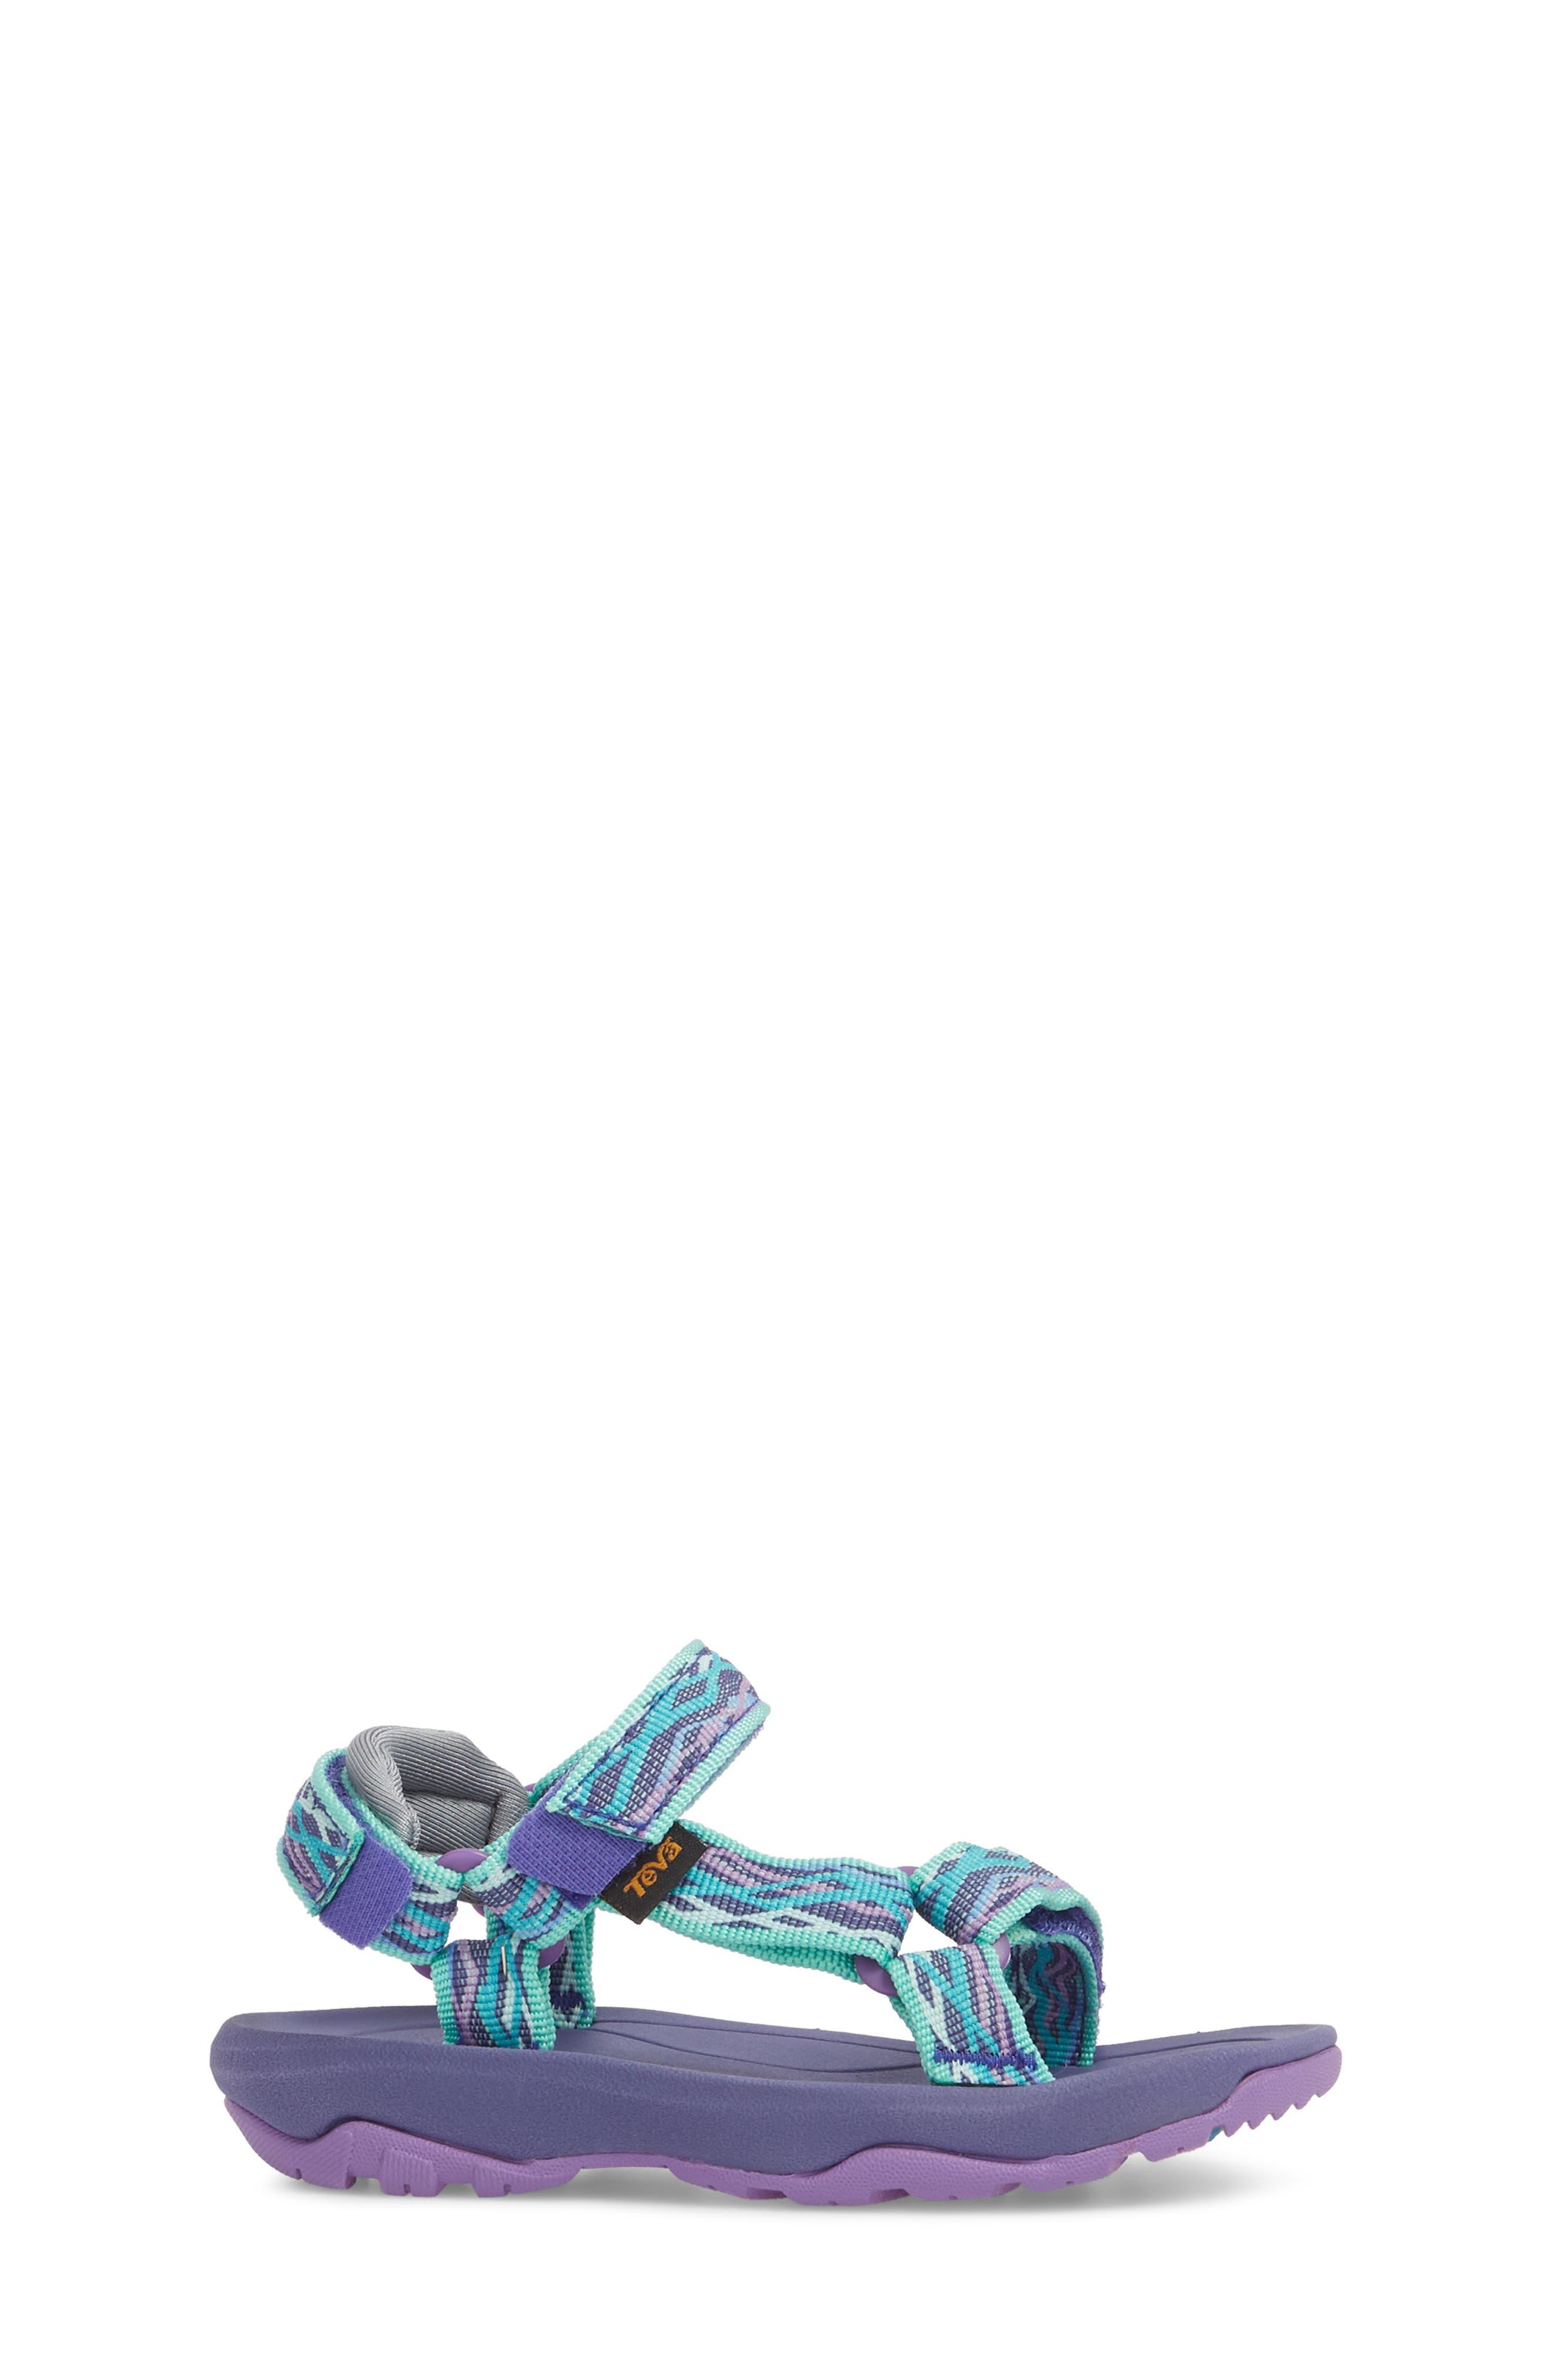 Hurricane XLT 2 Sandal,                             Alternate thumbnail 3, color,                             Delmar Sea Glass / Purple